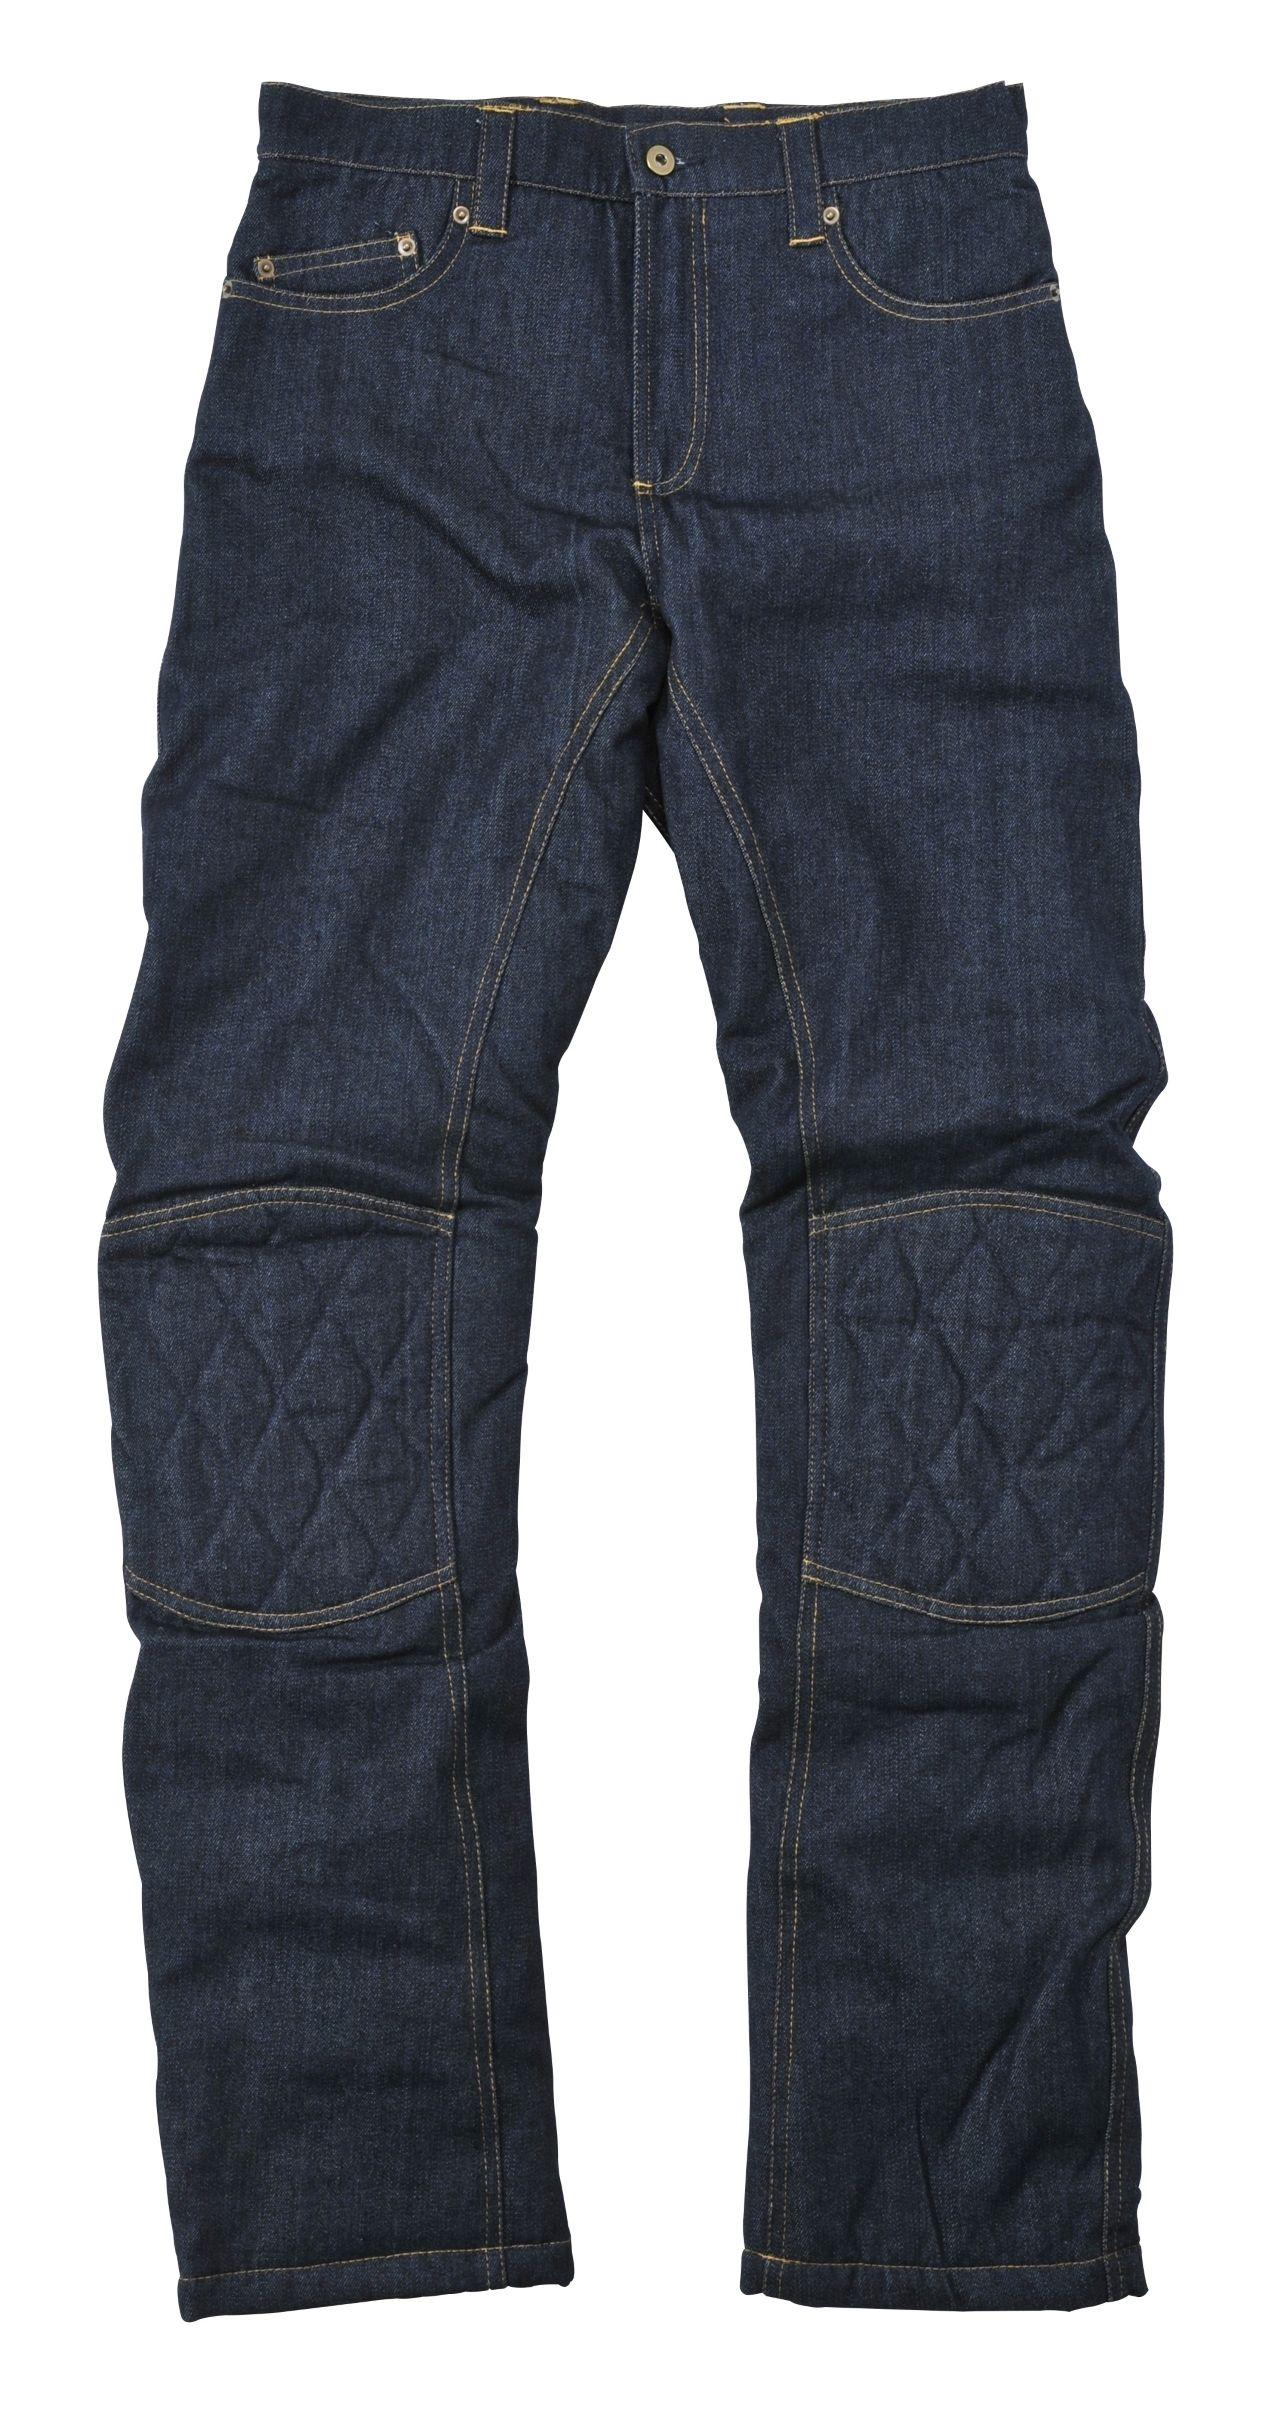 【Snap-on】丹寧牛仔車褲 - 「Webike-摩托百貨」